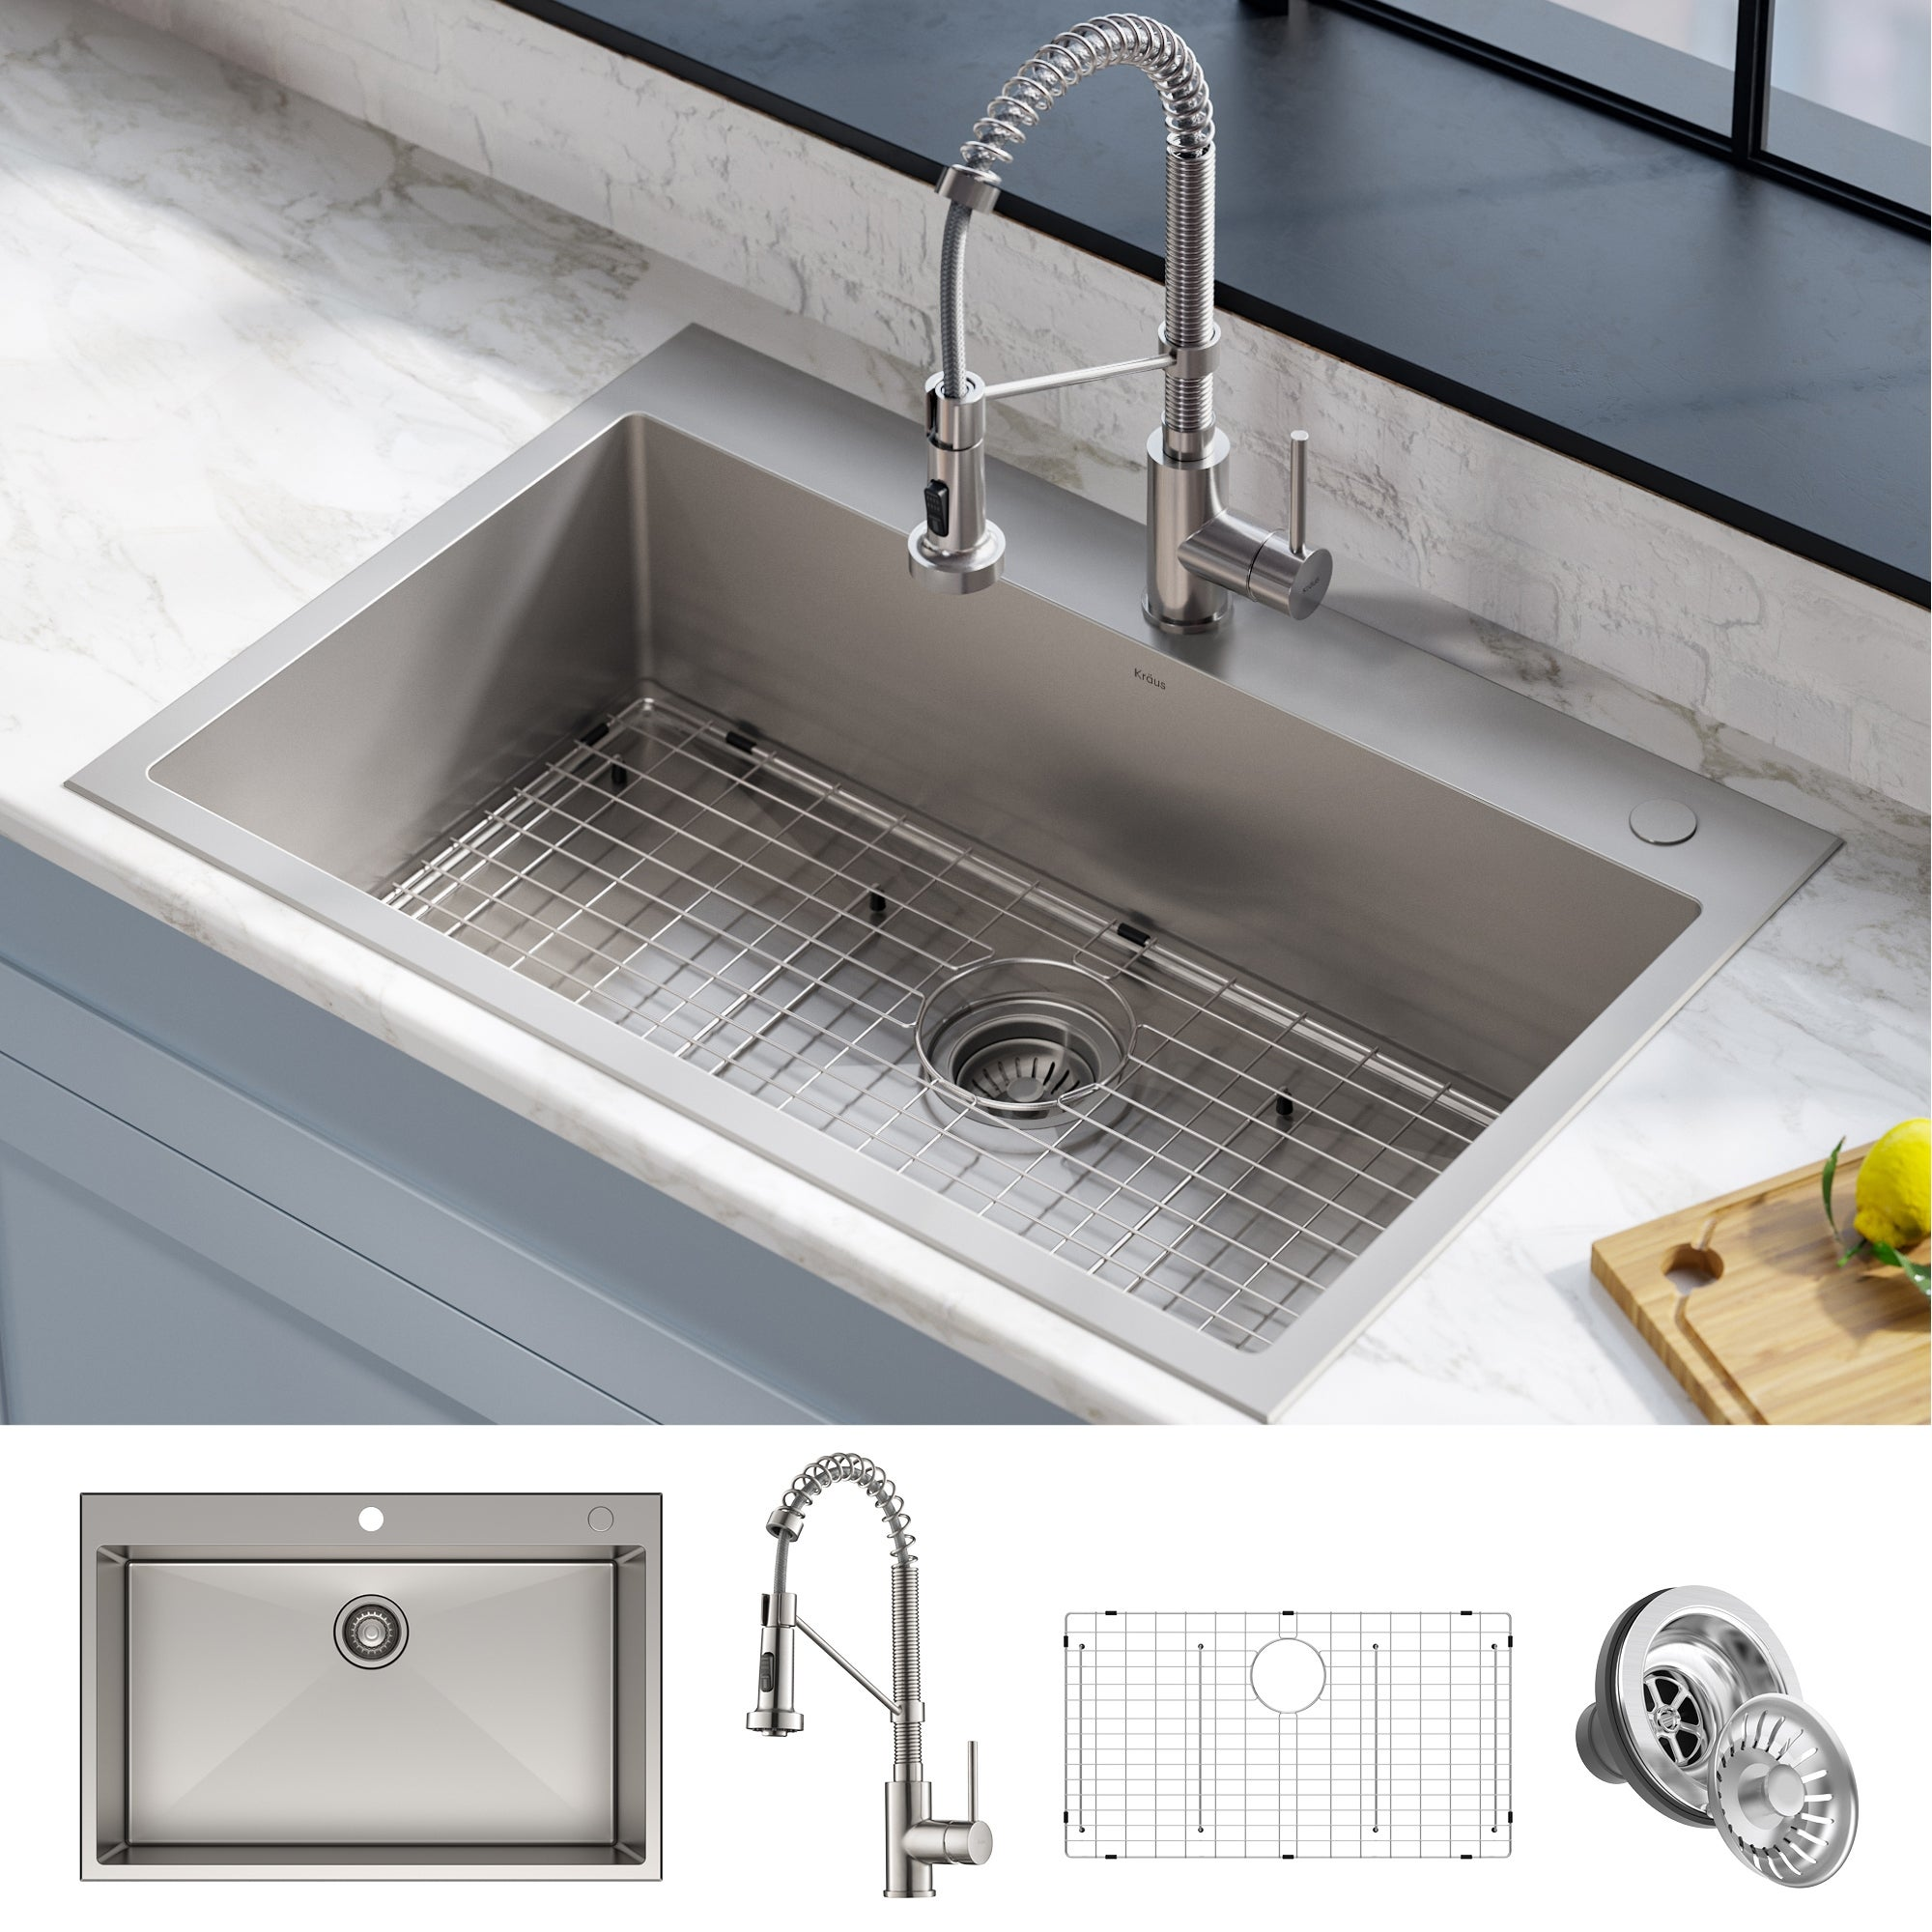 KRAUS Stark 12-inch Undermount Drop-in Kitchen Sink Pulldown Faucet Combo